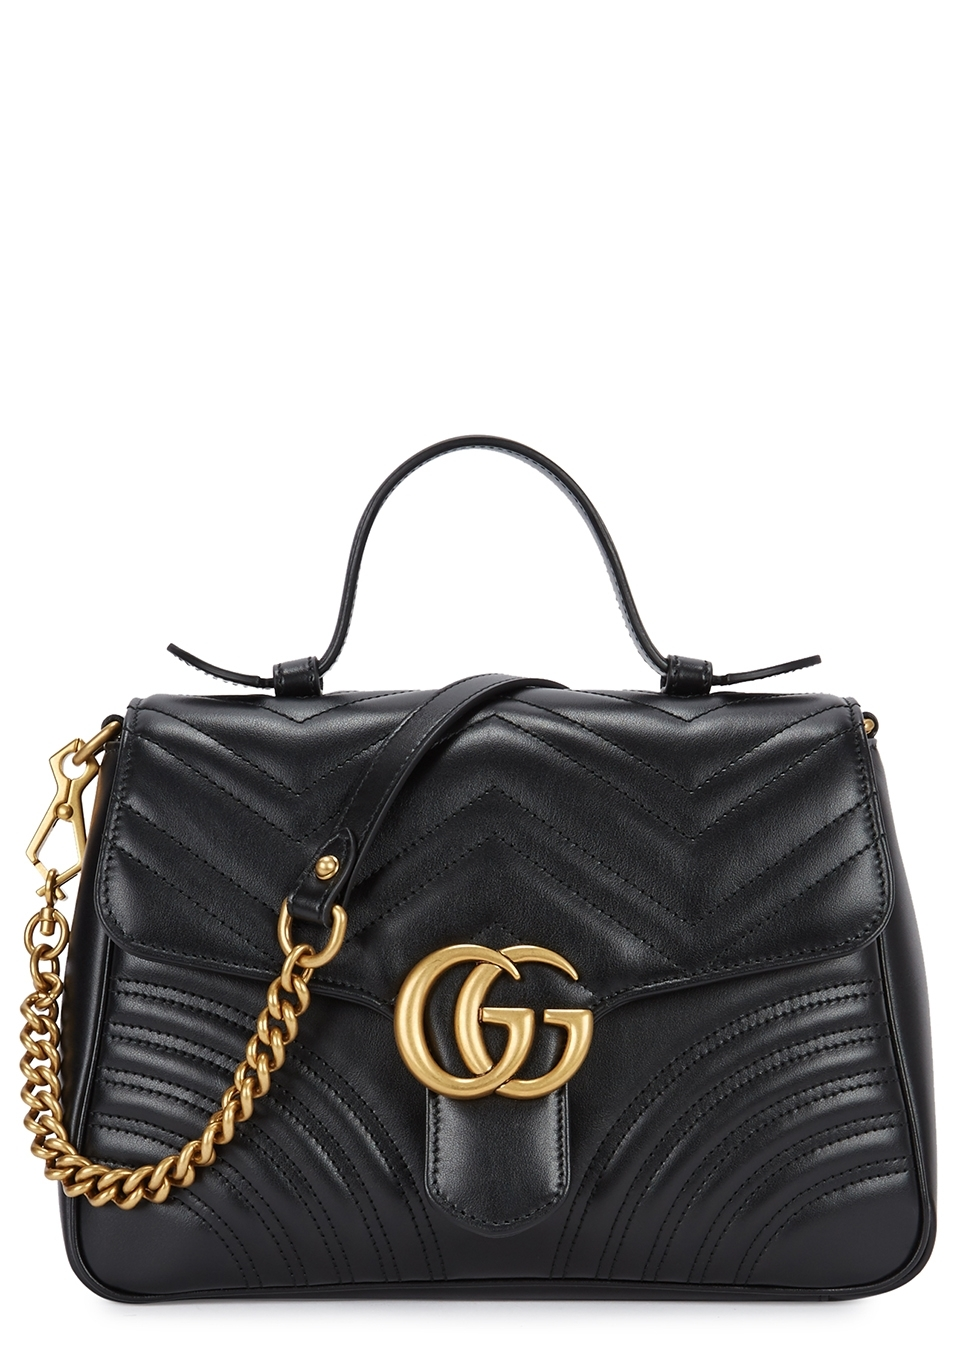 feb7d75e78e5 Women s Designer Bags